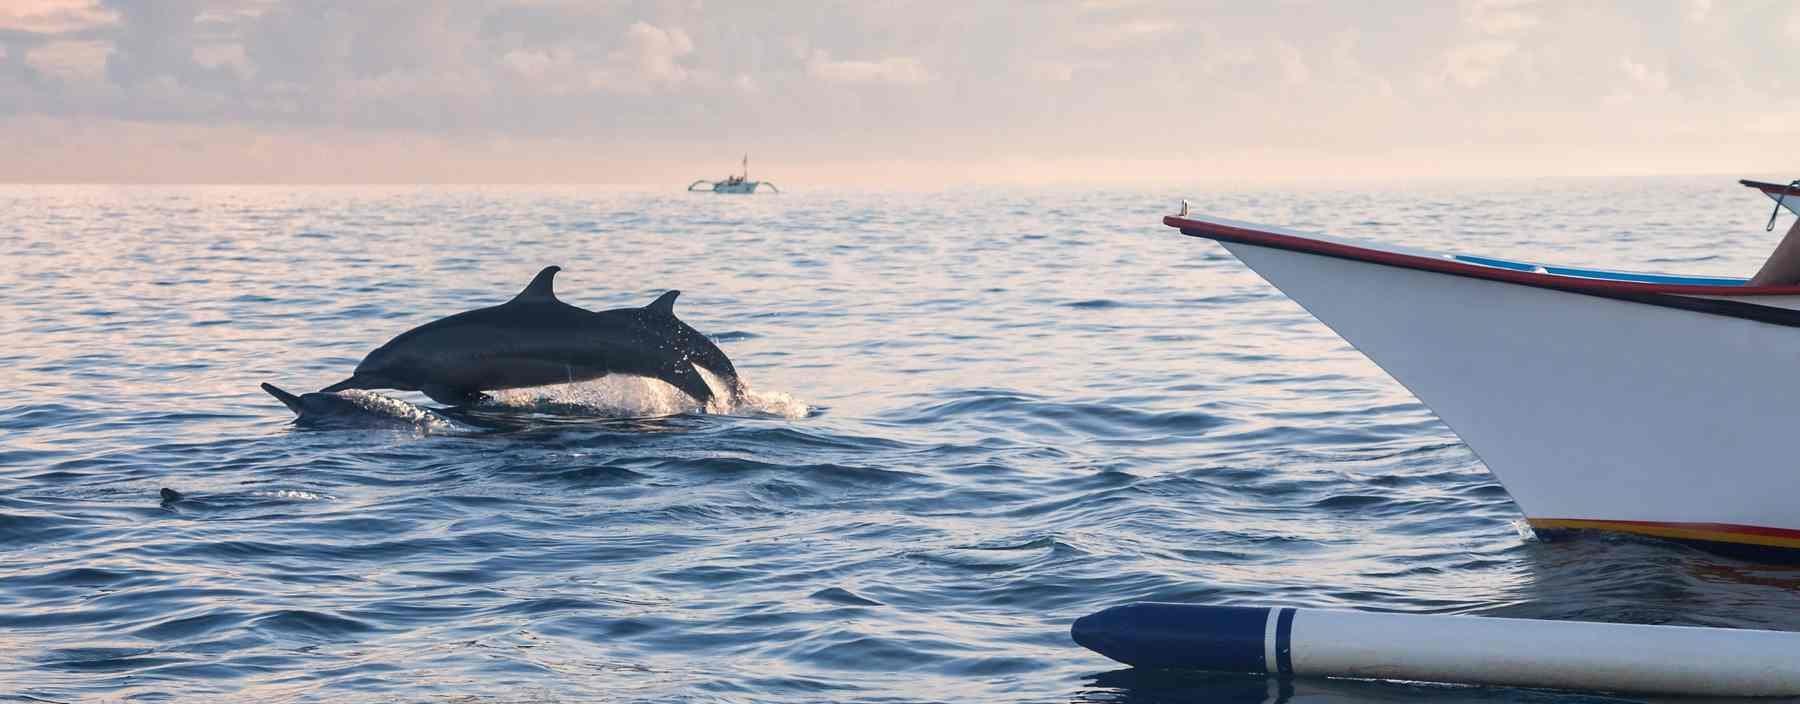 id, bali, lovina, dolphins jumping lovina beach (2).jpg